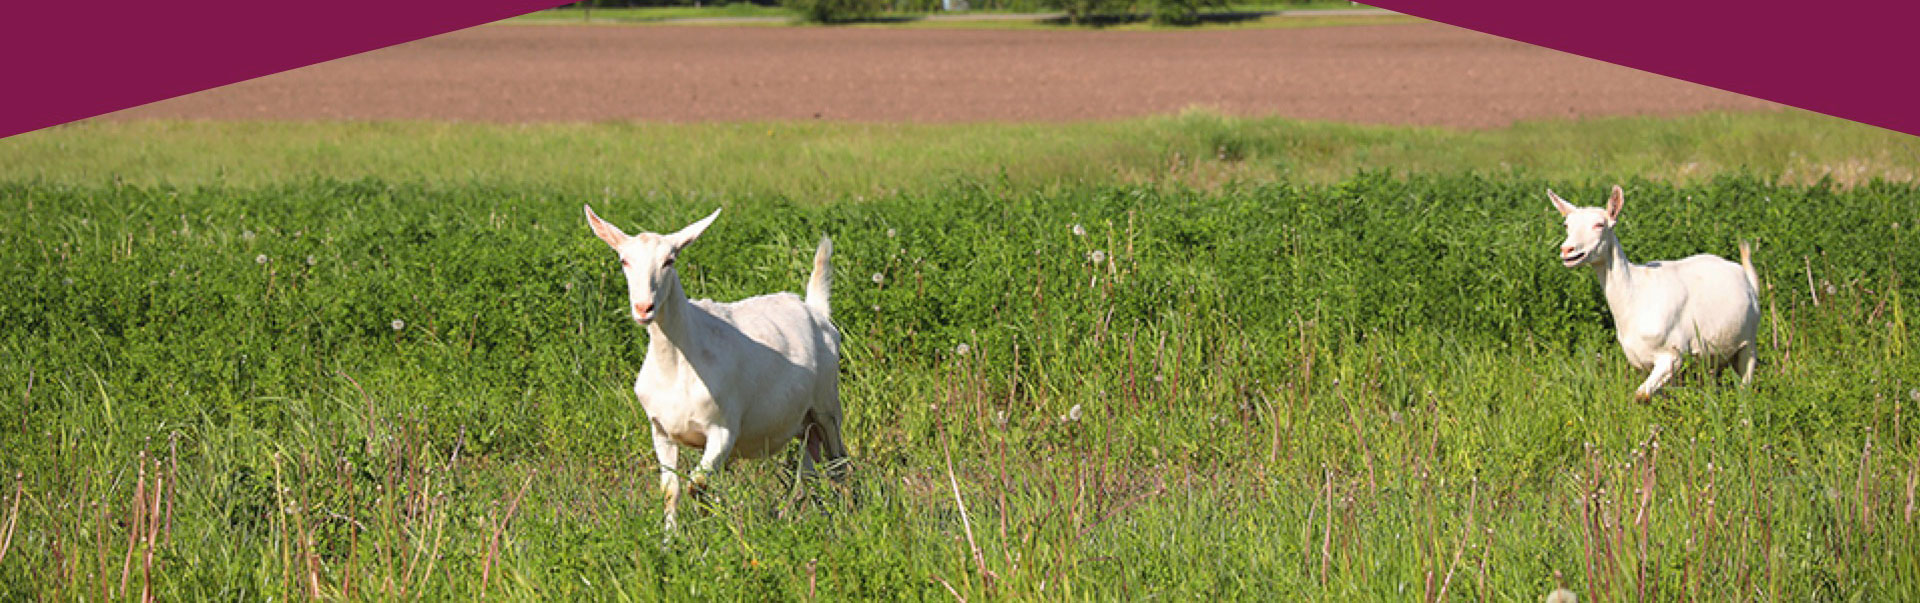 Award-winning goat and sheep milk cheeses